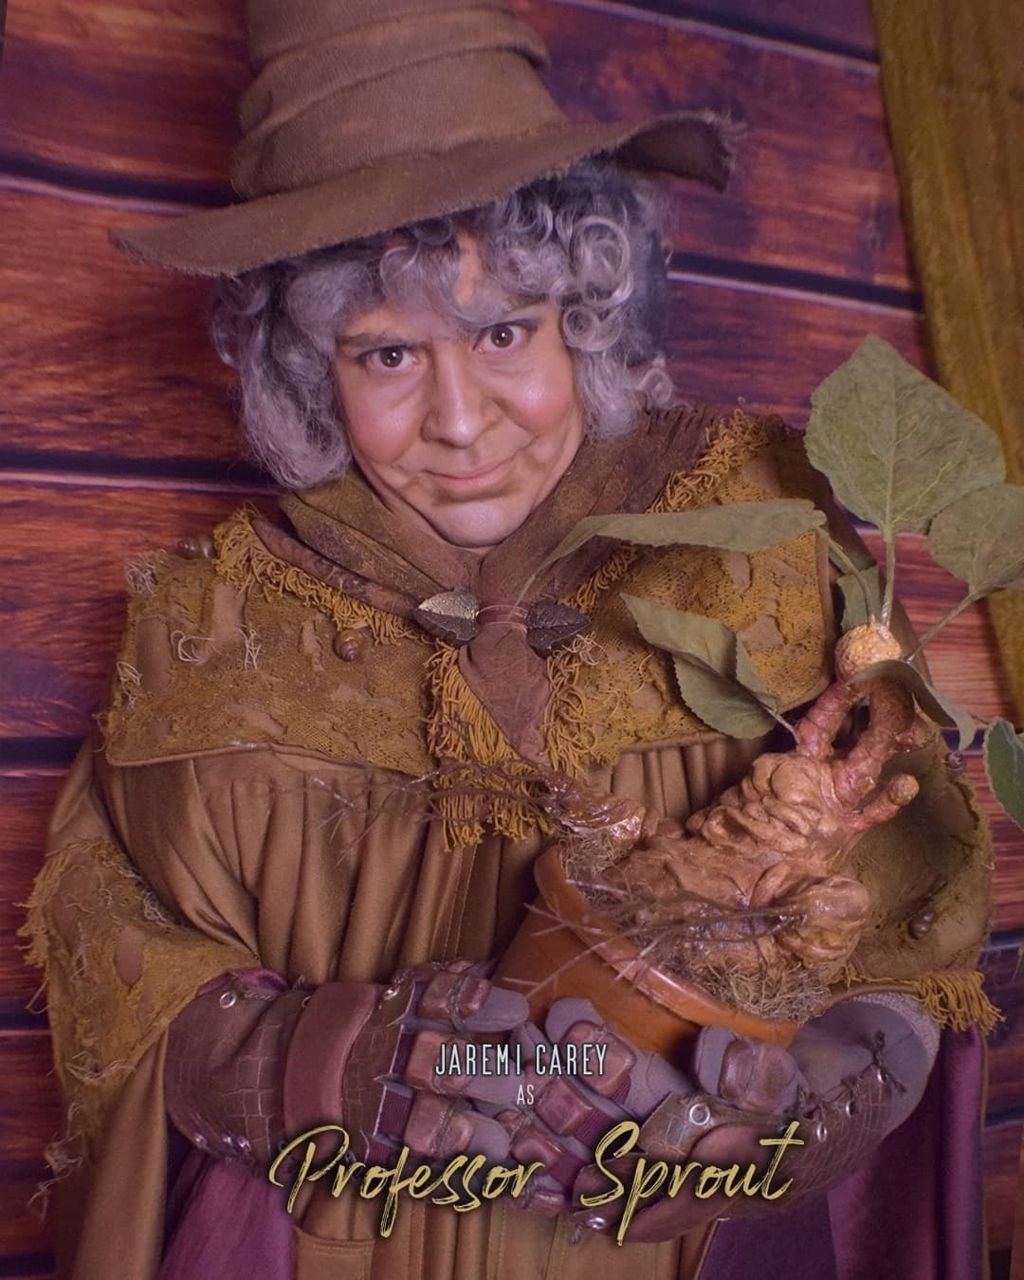 Jaremi Carey as Professor Sprout